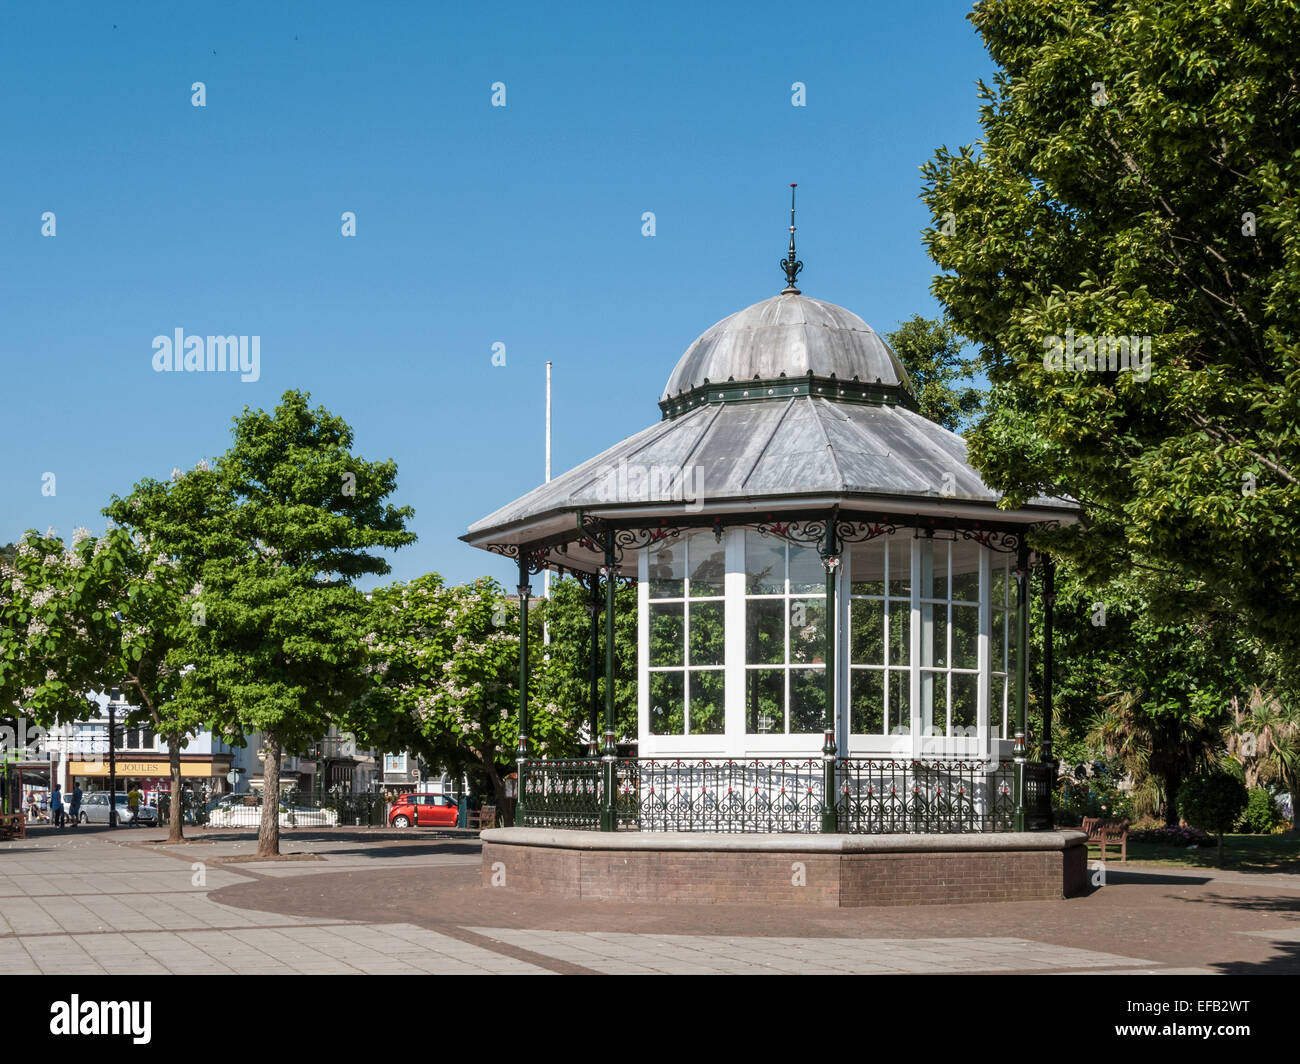 Dartmouth Bandstand in Devon, UK - Stock Image